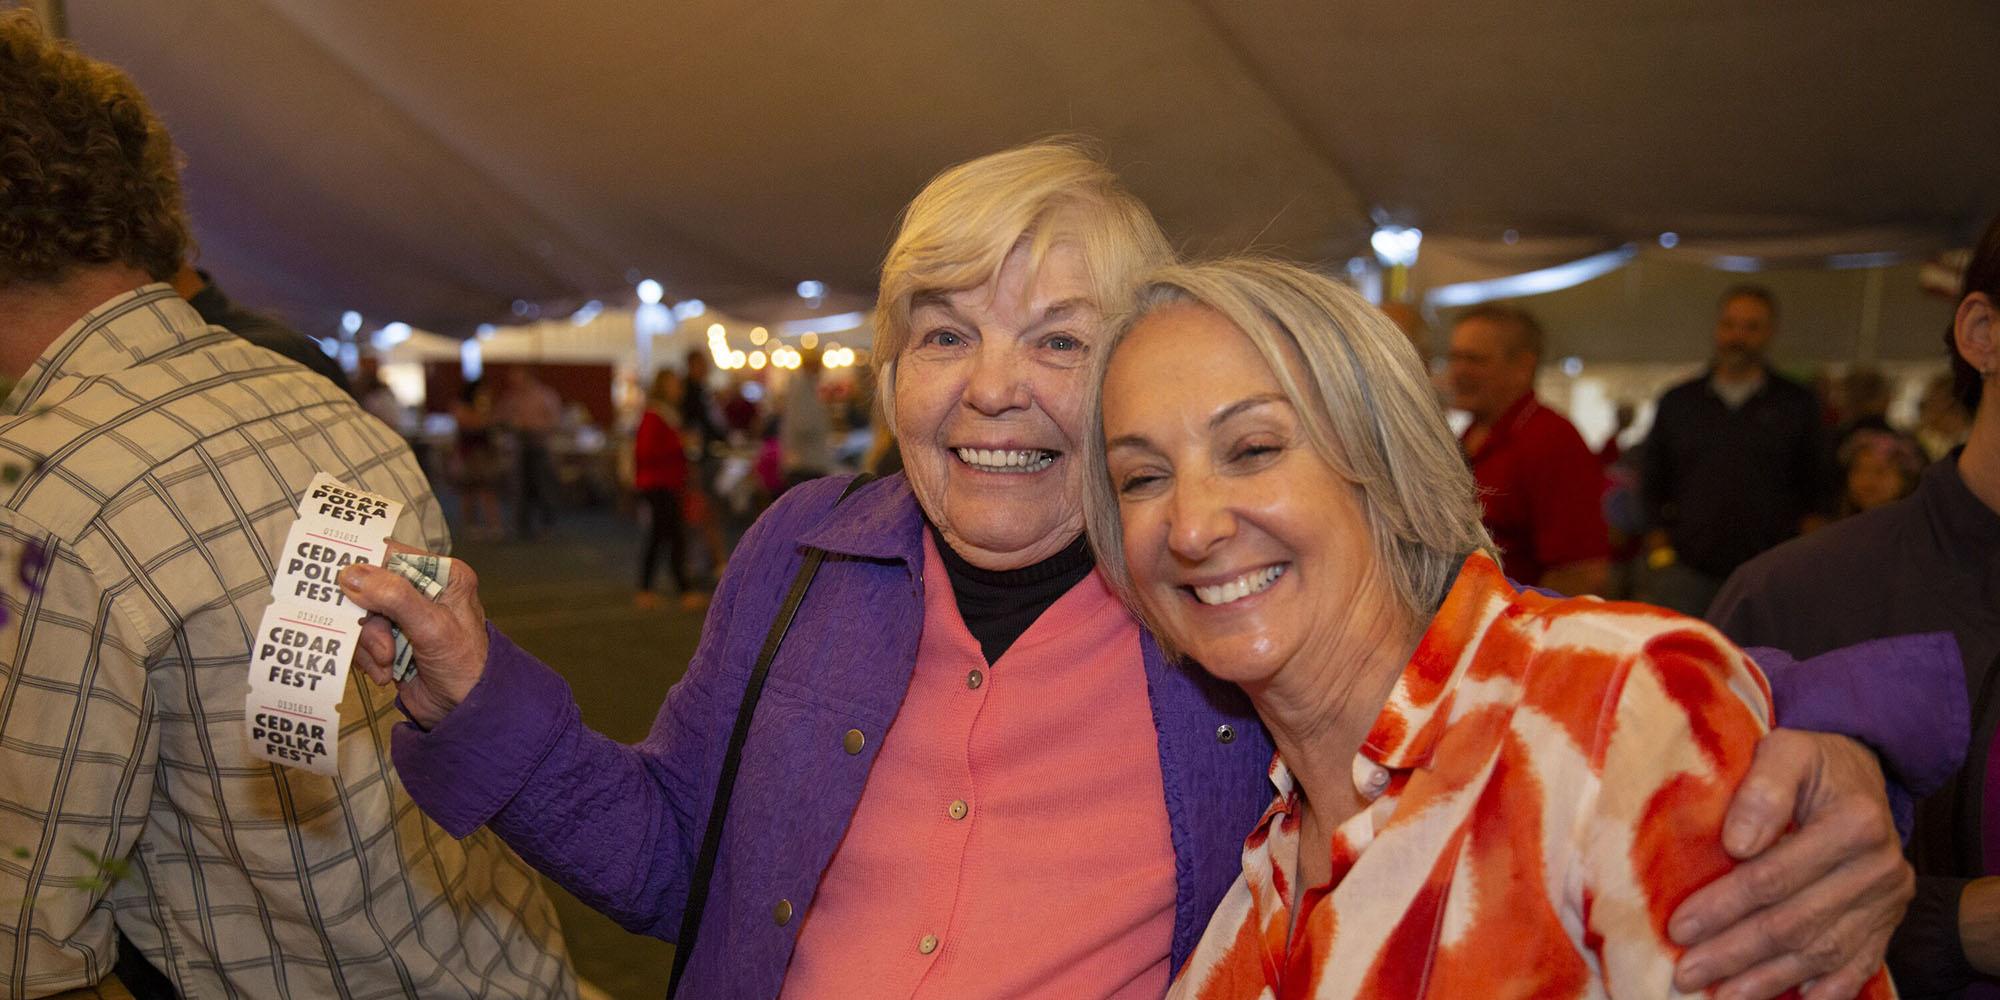 Ticket Ladies at Cedar Polka Fest